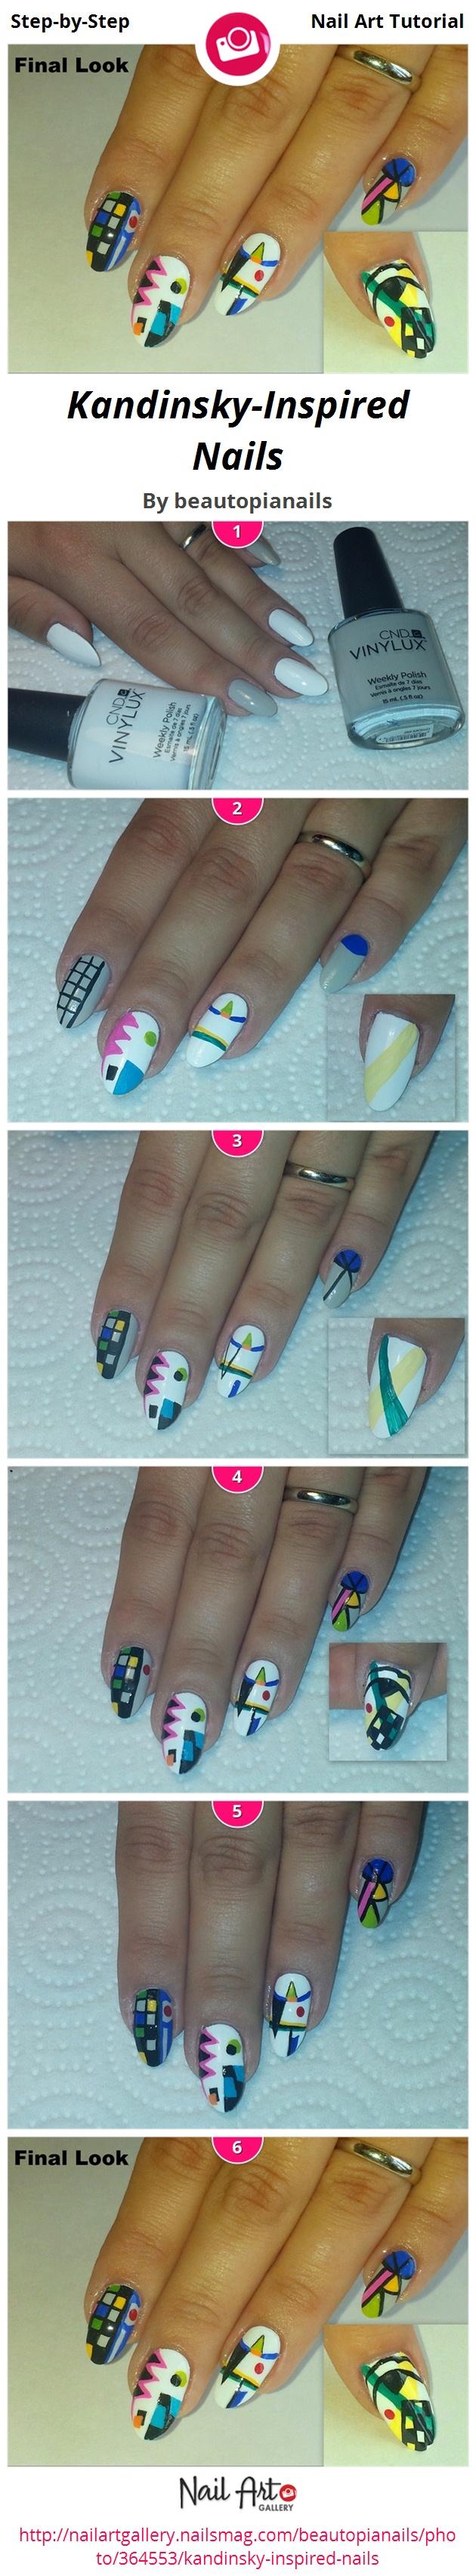 Kandinsky-Inspired Nails - Nail Art Gallery